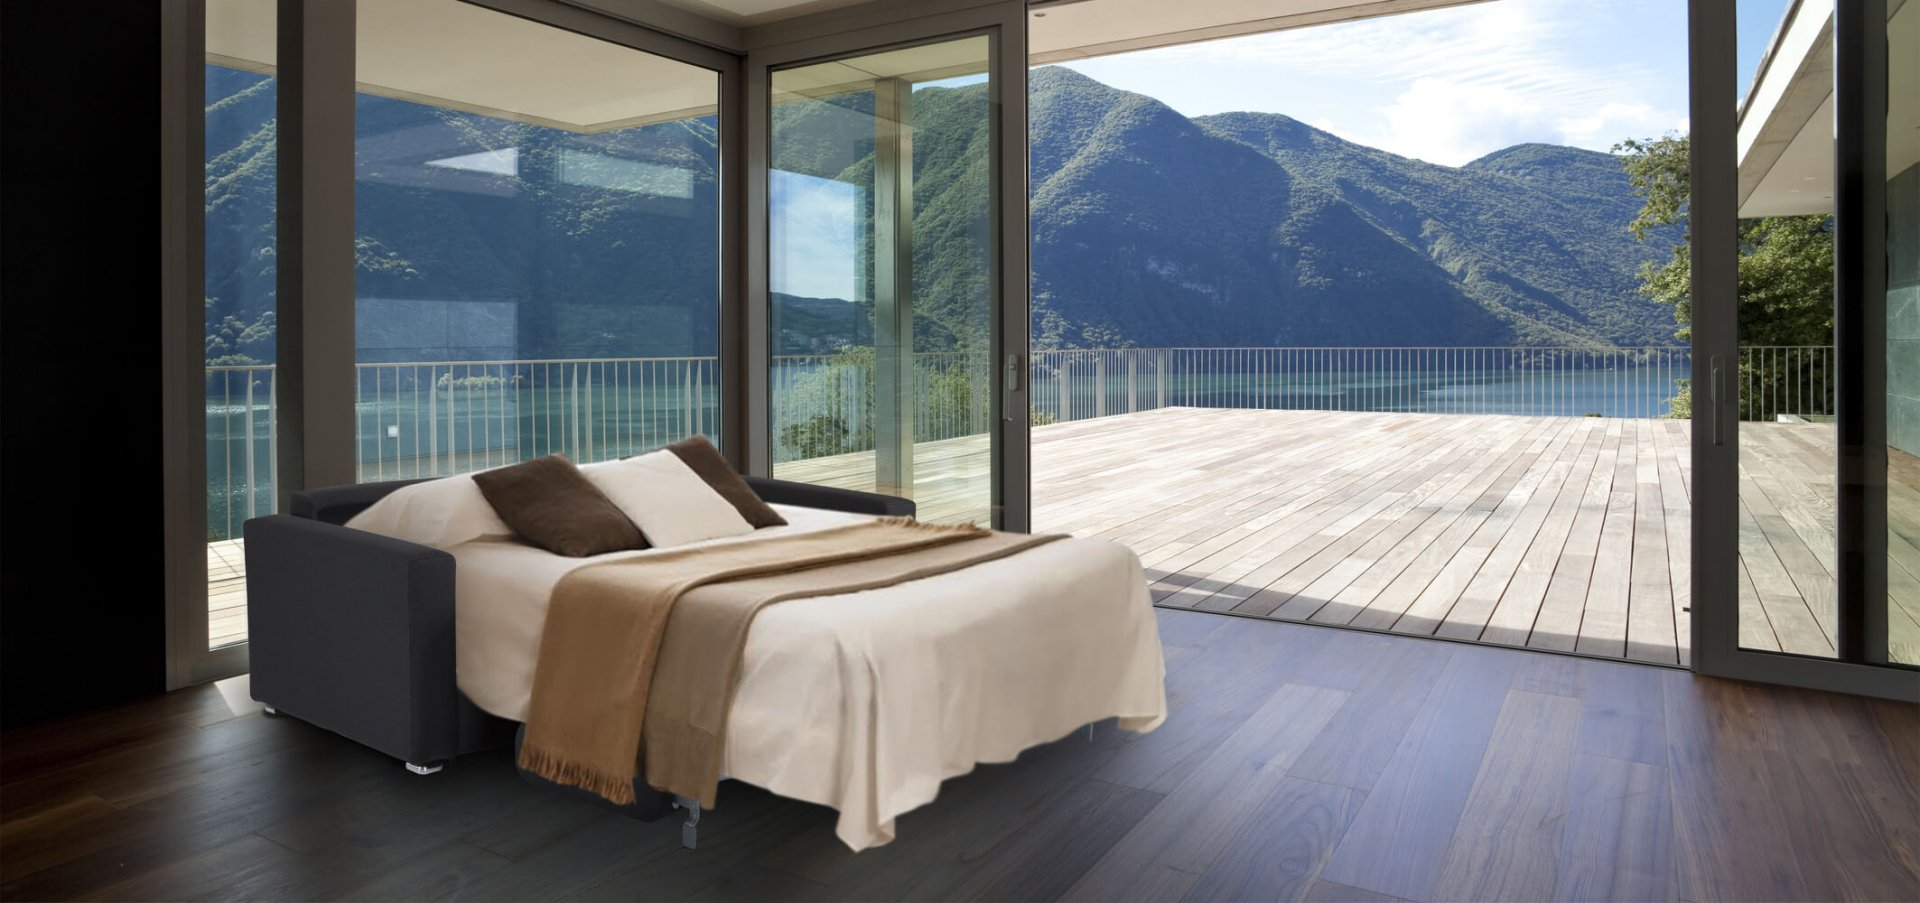 Breeze Pezzan space-saving furniture